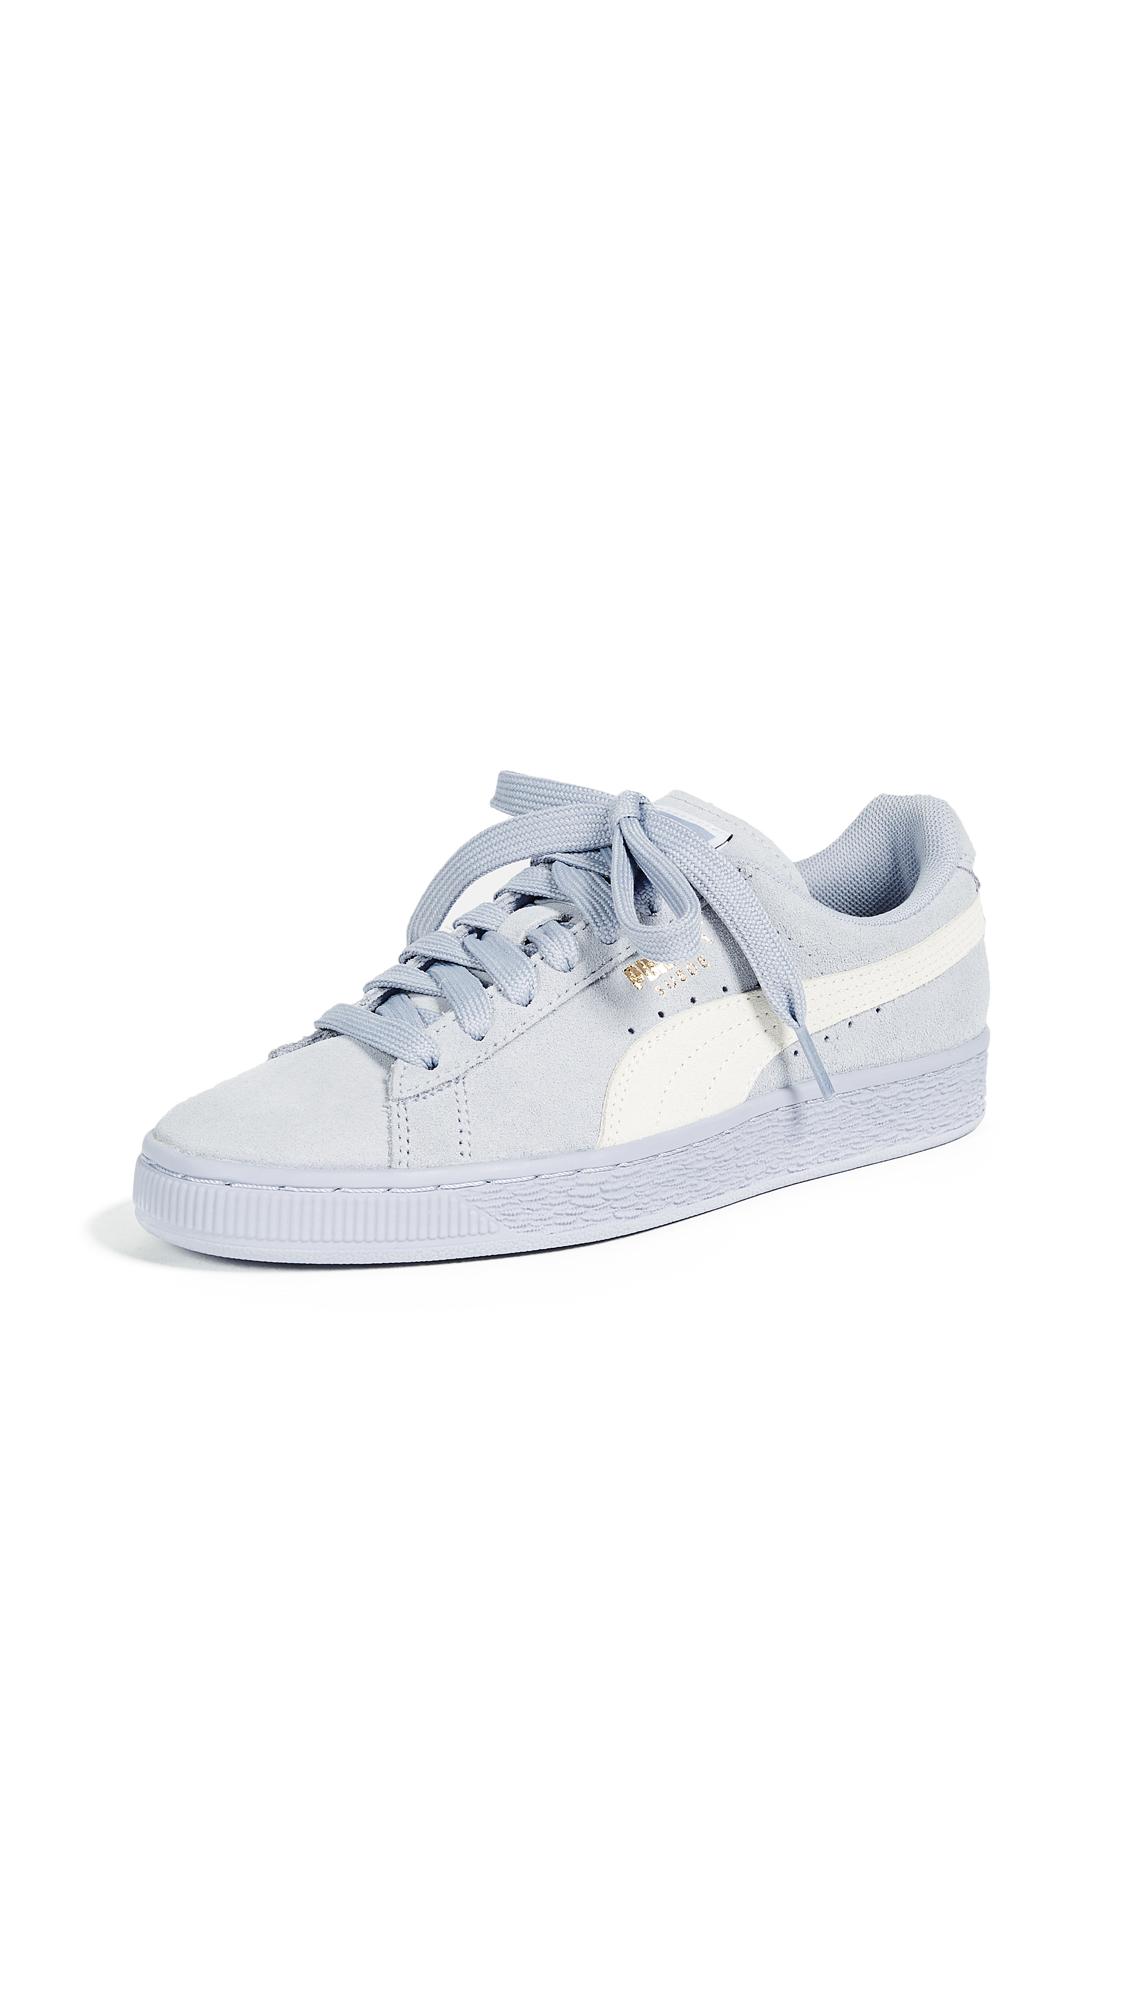 PUMA Suede Classic Sneakers - Icelandic Blue/Puma White